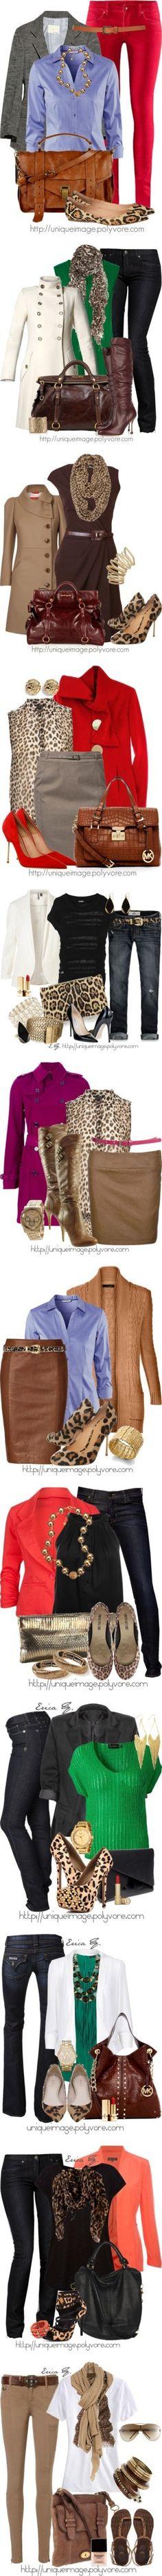 Work outfits. Wardrobe Renewal. Love it!